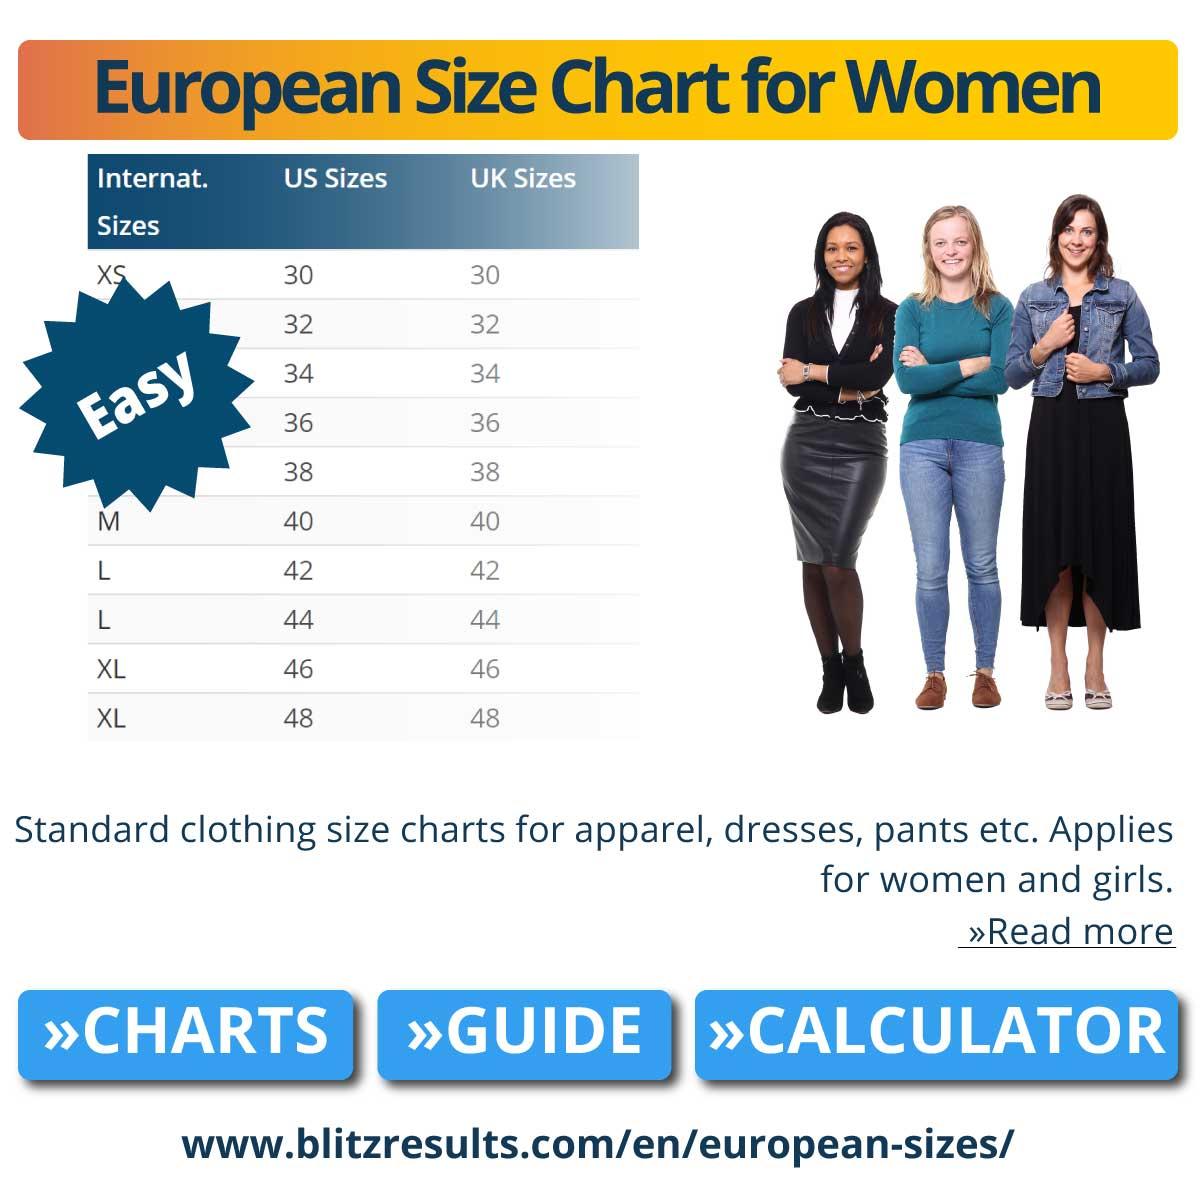 European Size Chart for Women